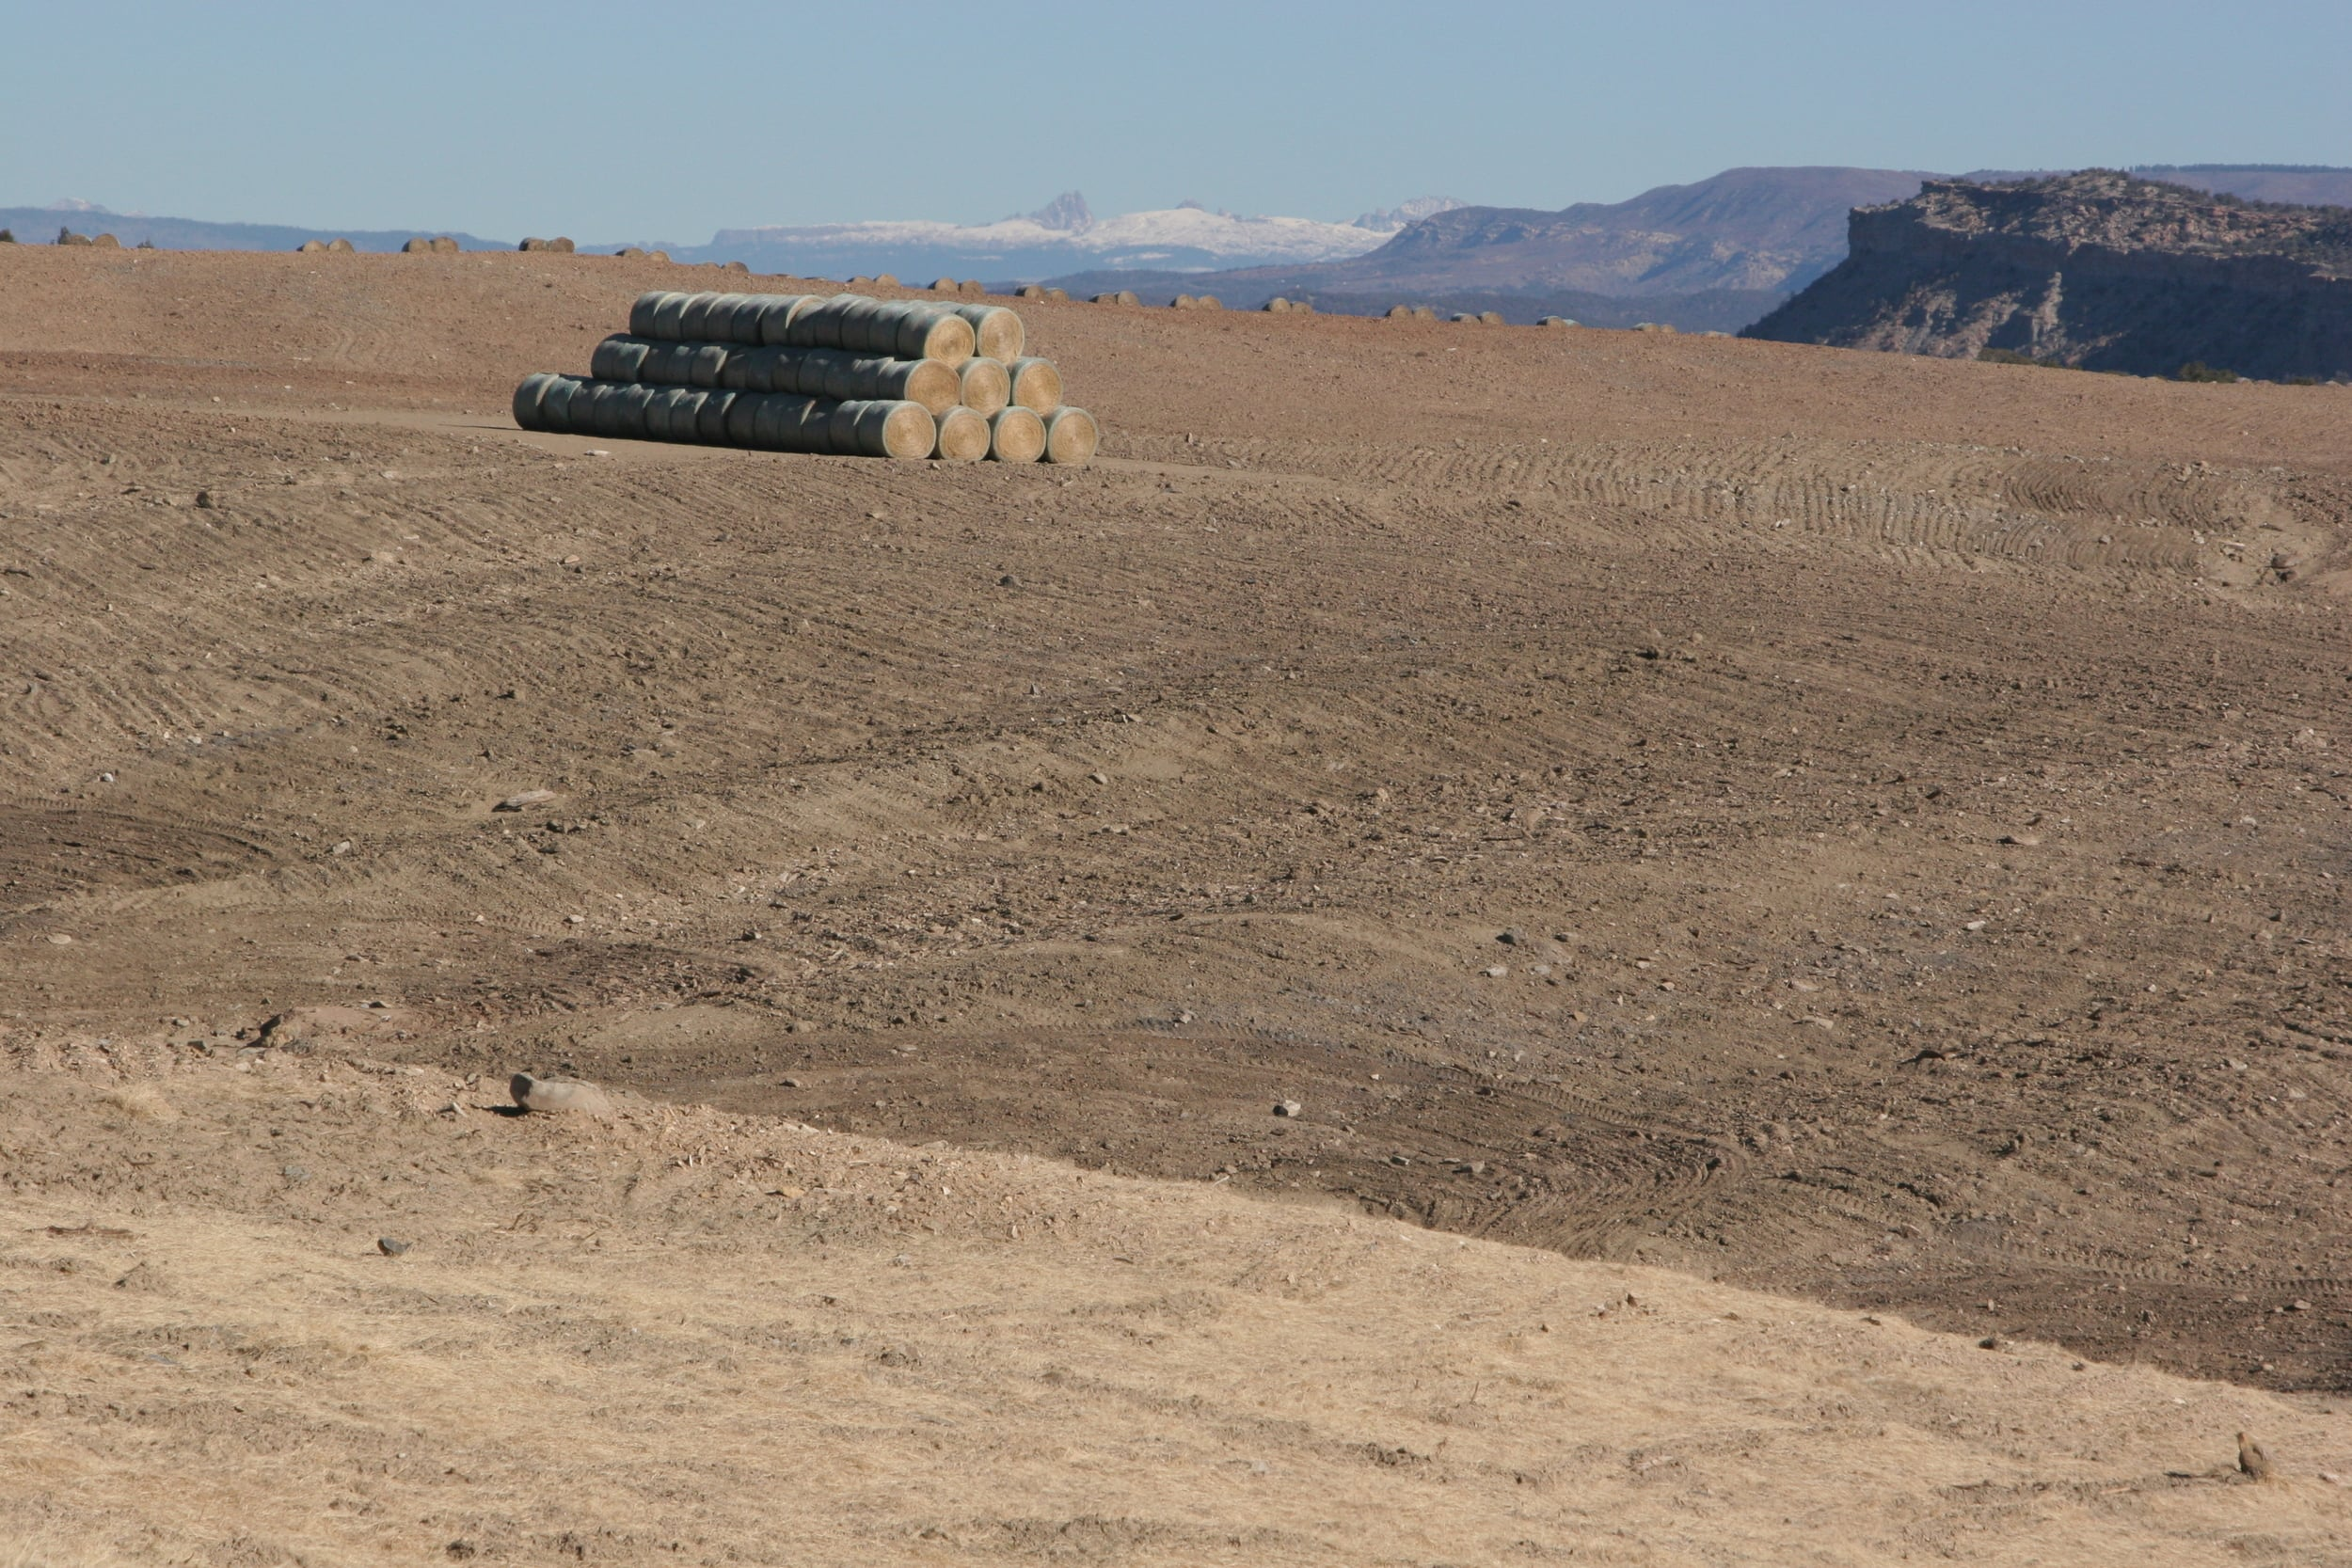 IMG_2881 - Hay Pile & Drilling - LaPlata.JPG